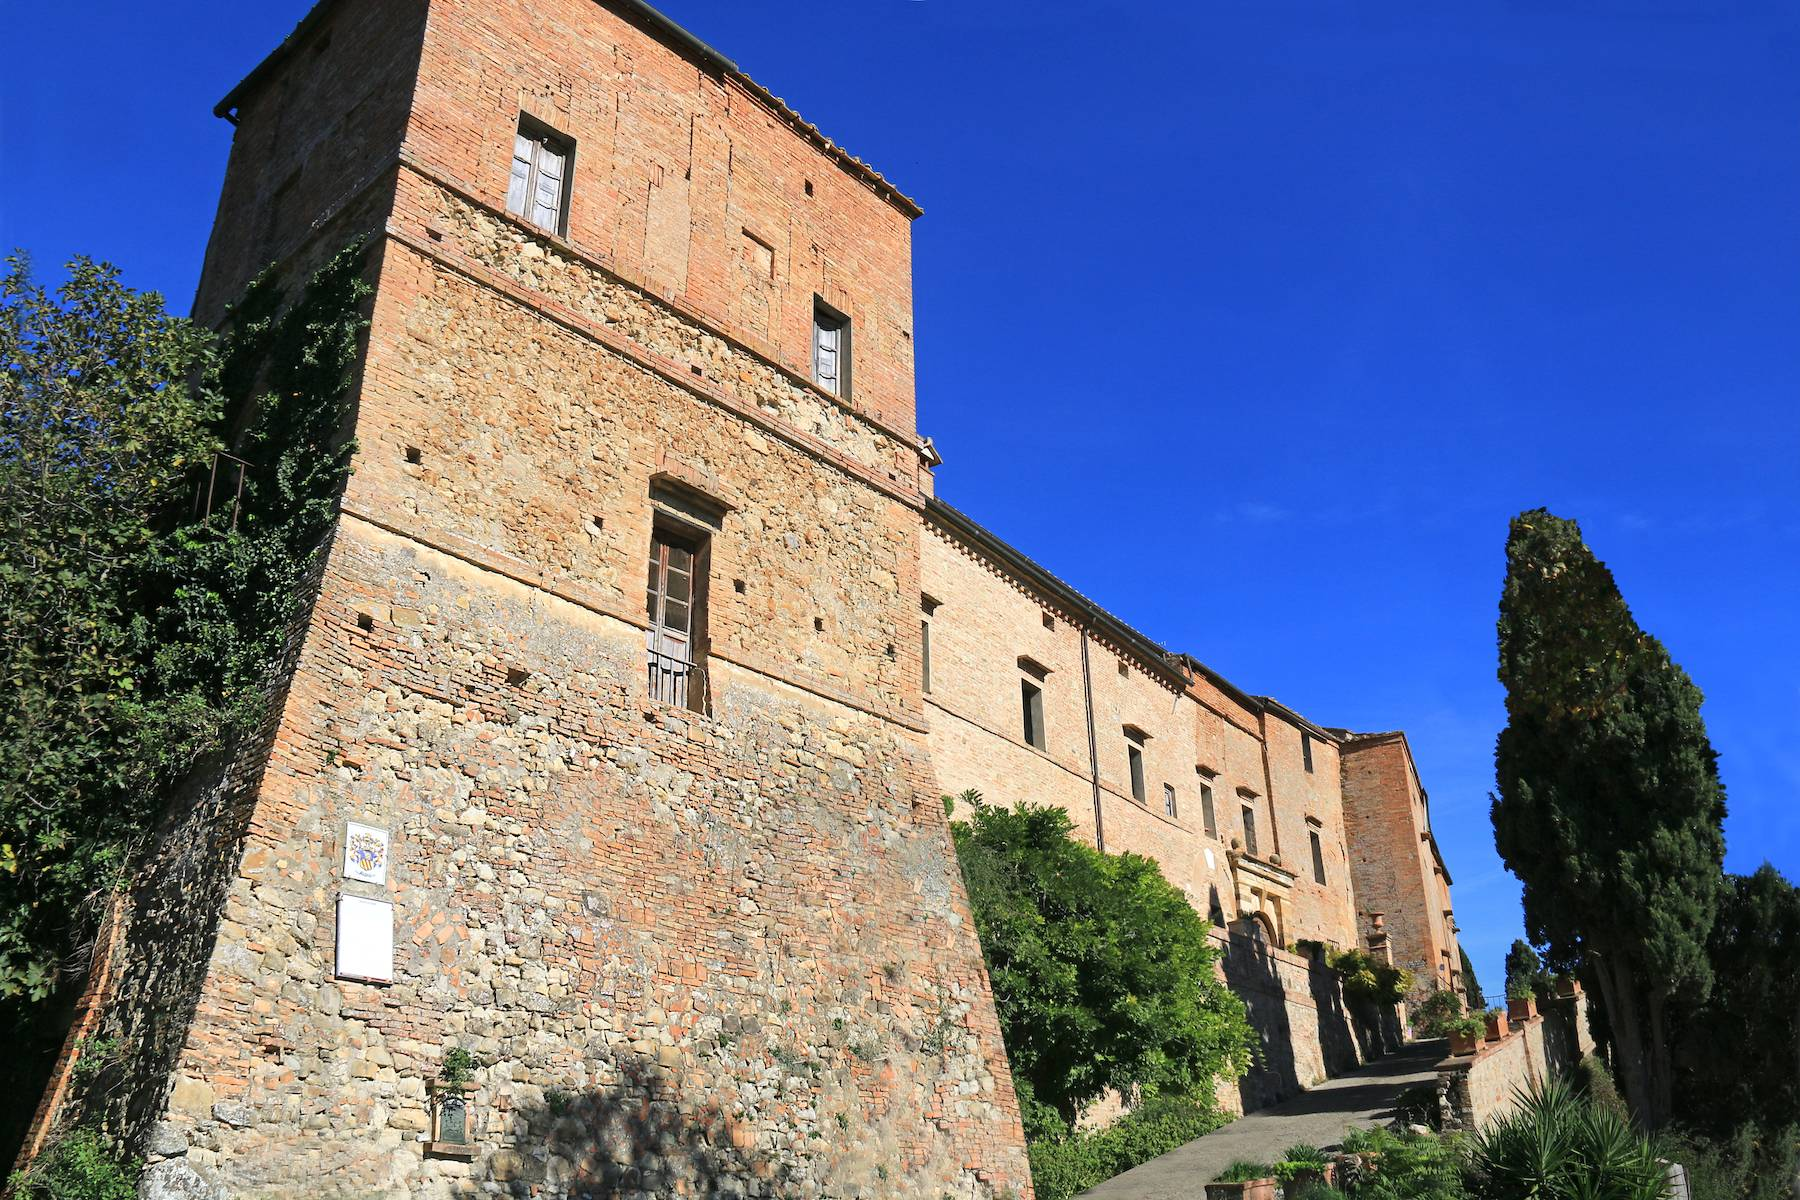 Wunderschönes Schloss im Herzen der Toskana - 6